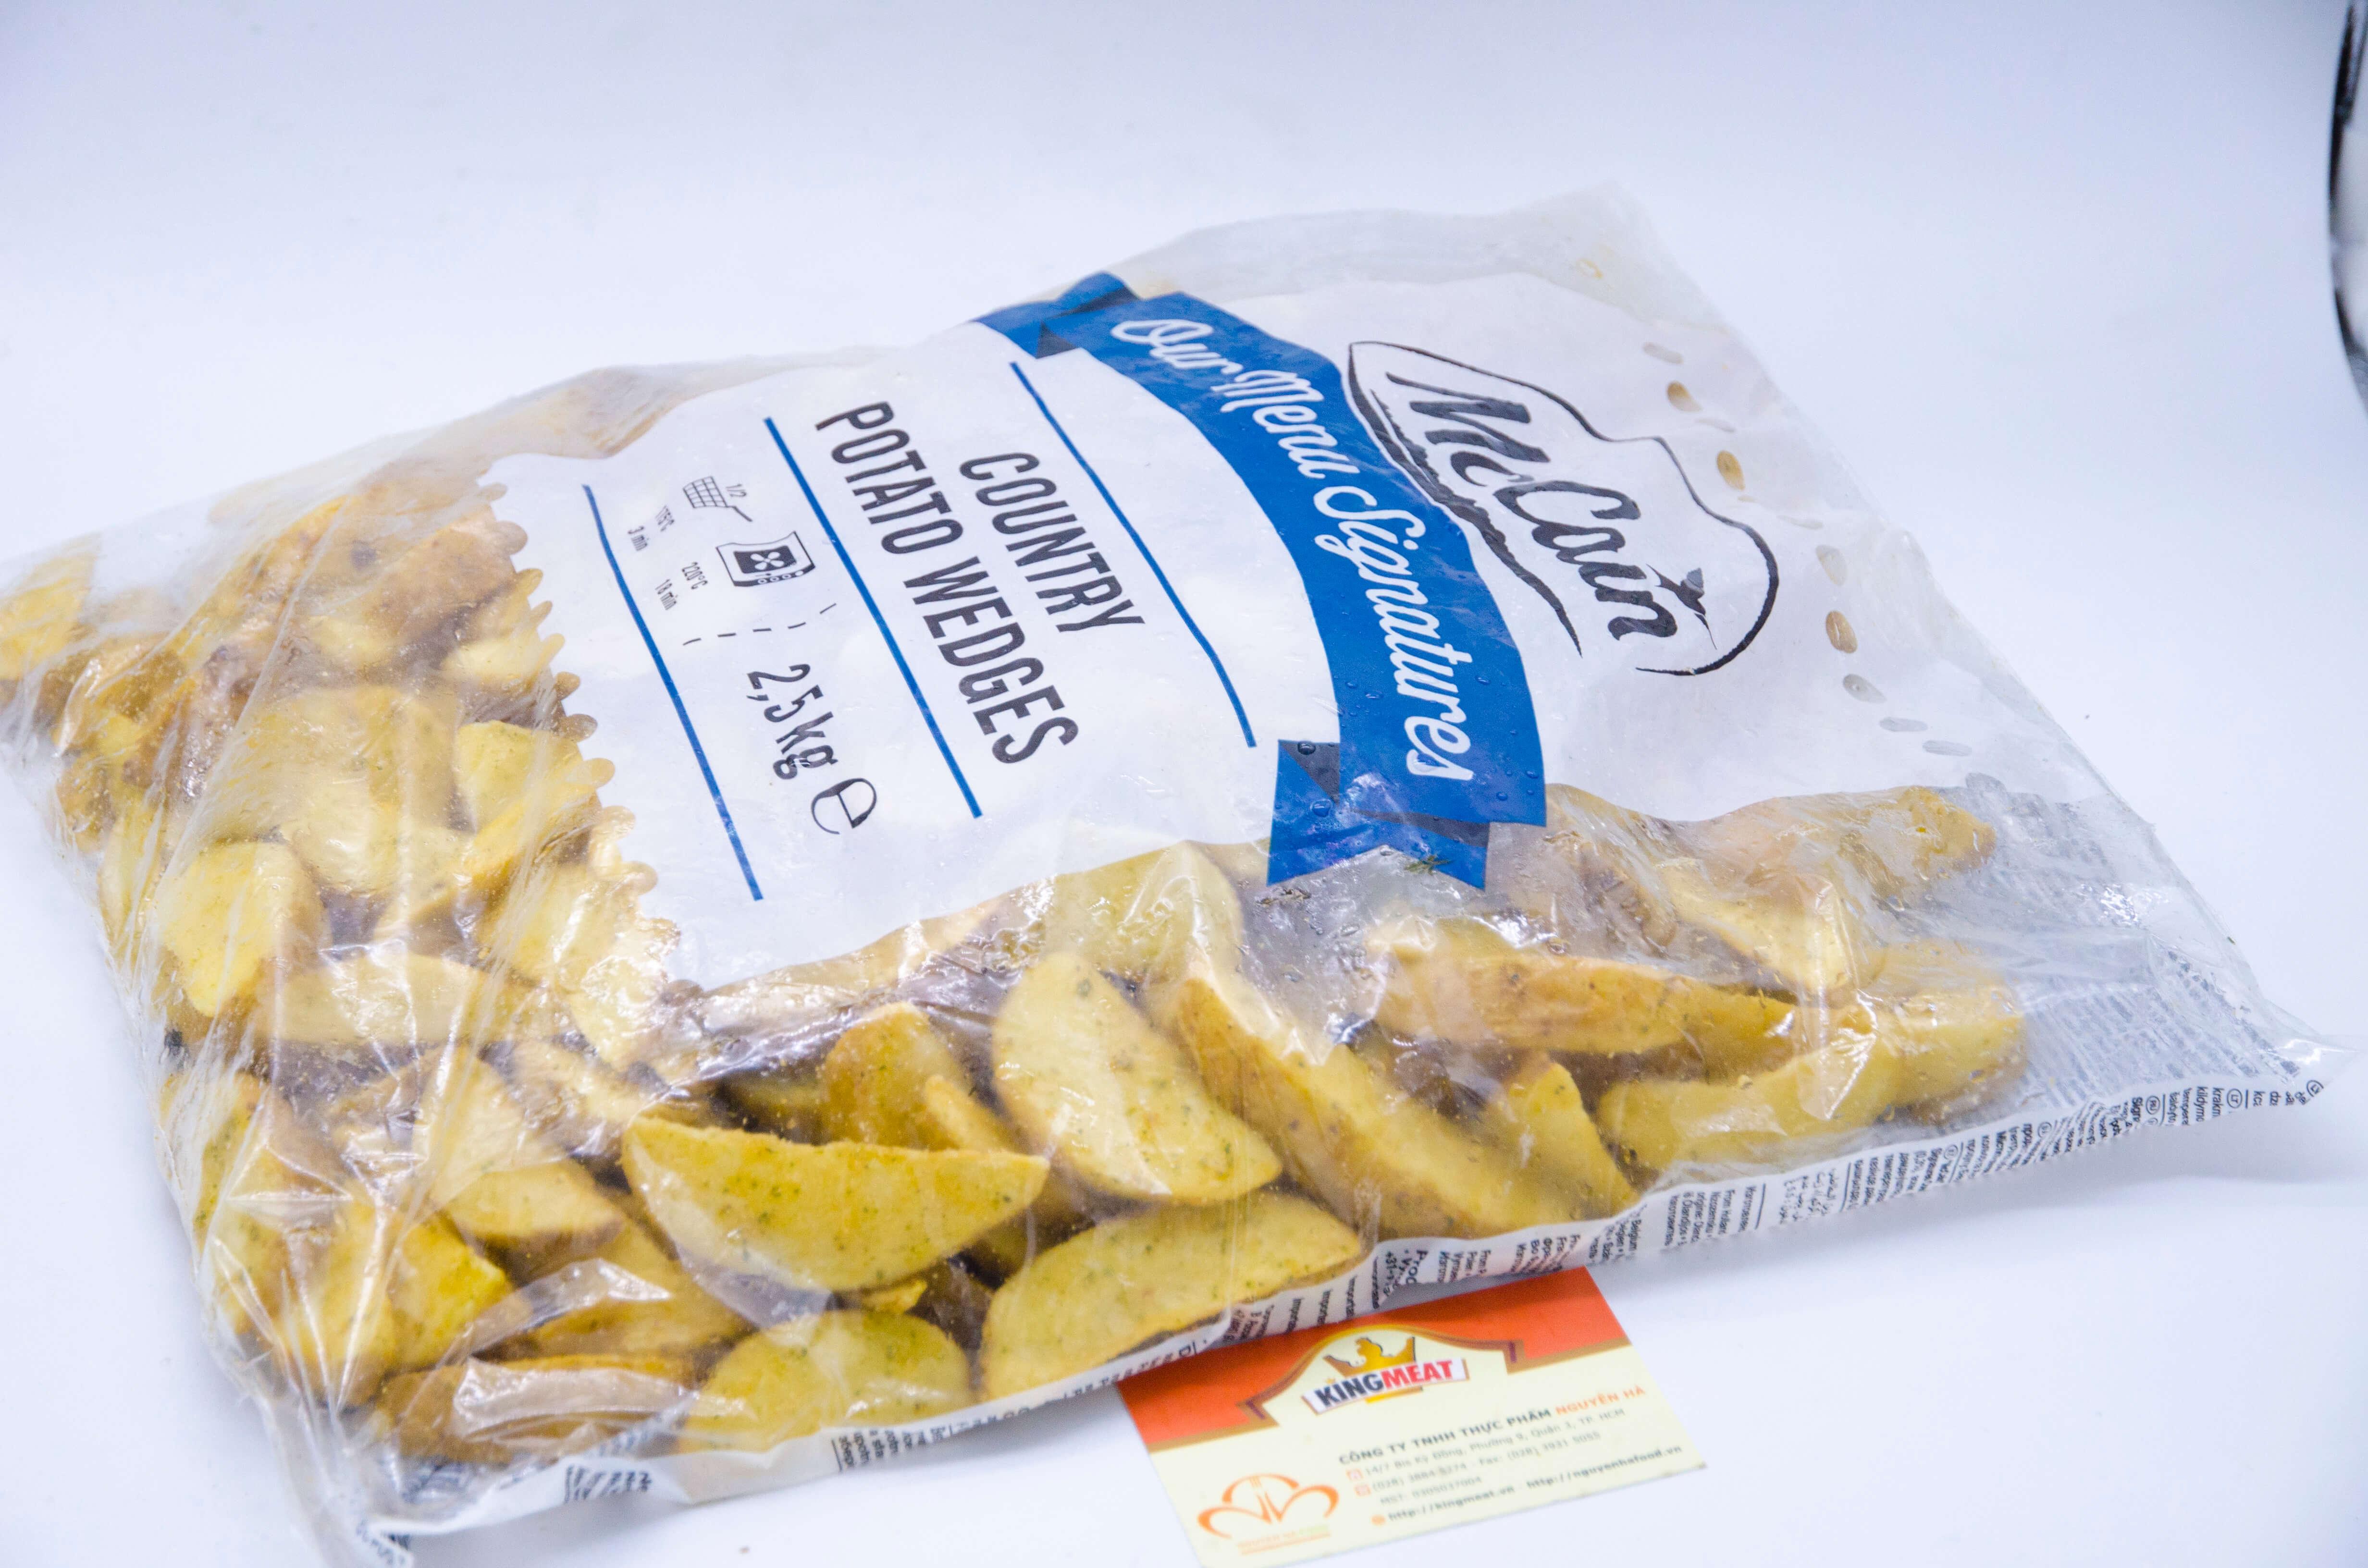 Khoai tây Cắt múi tẩm tỏi McCain – McCain Country Potato Wedges -(2.5kg/bao)